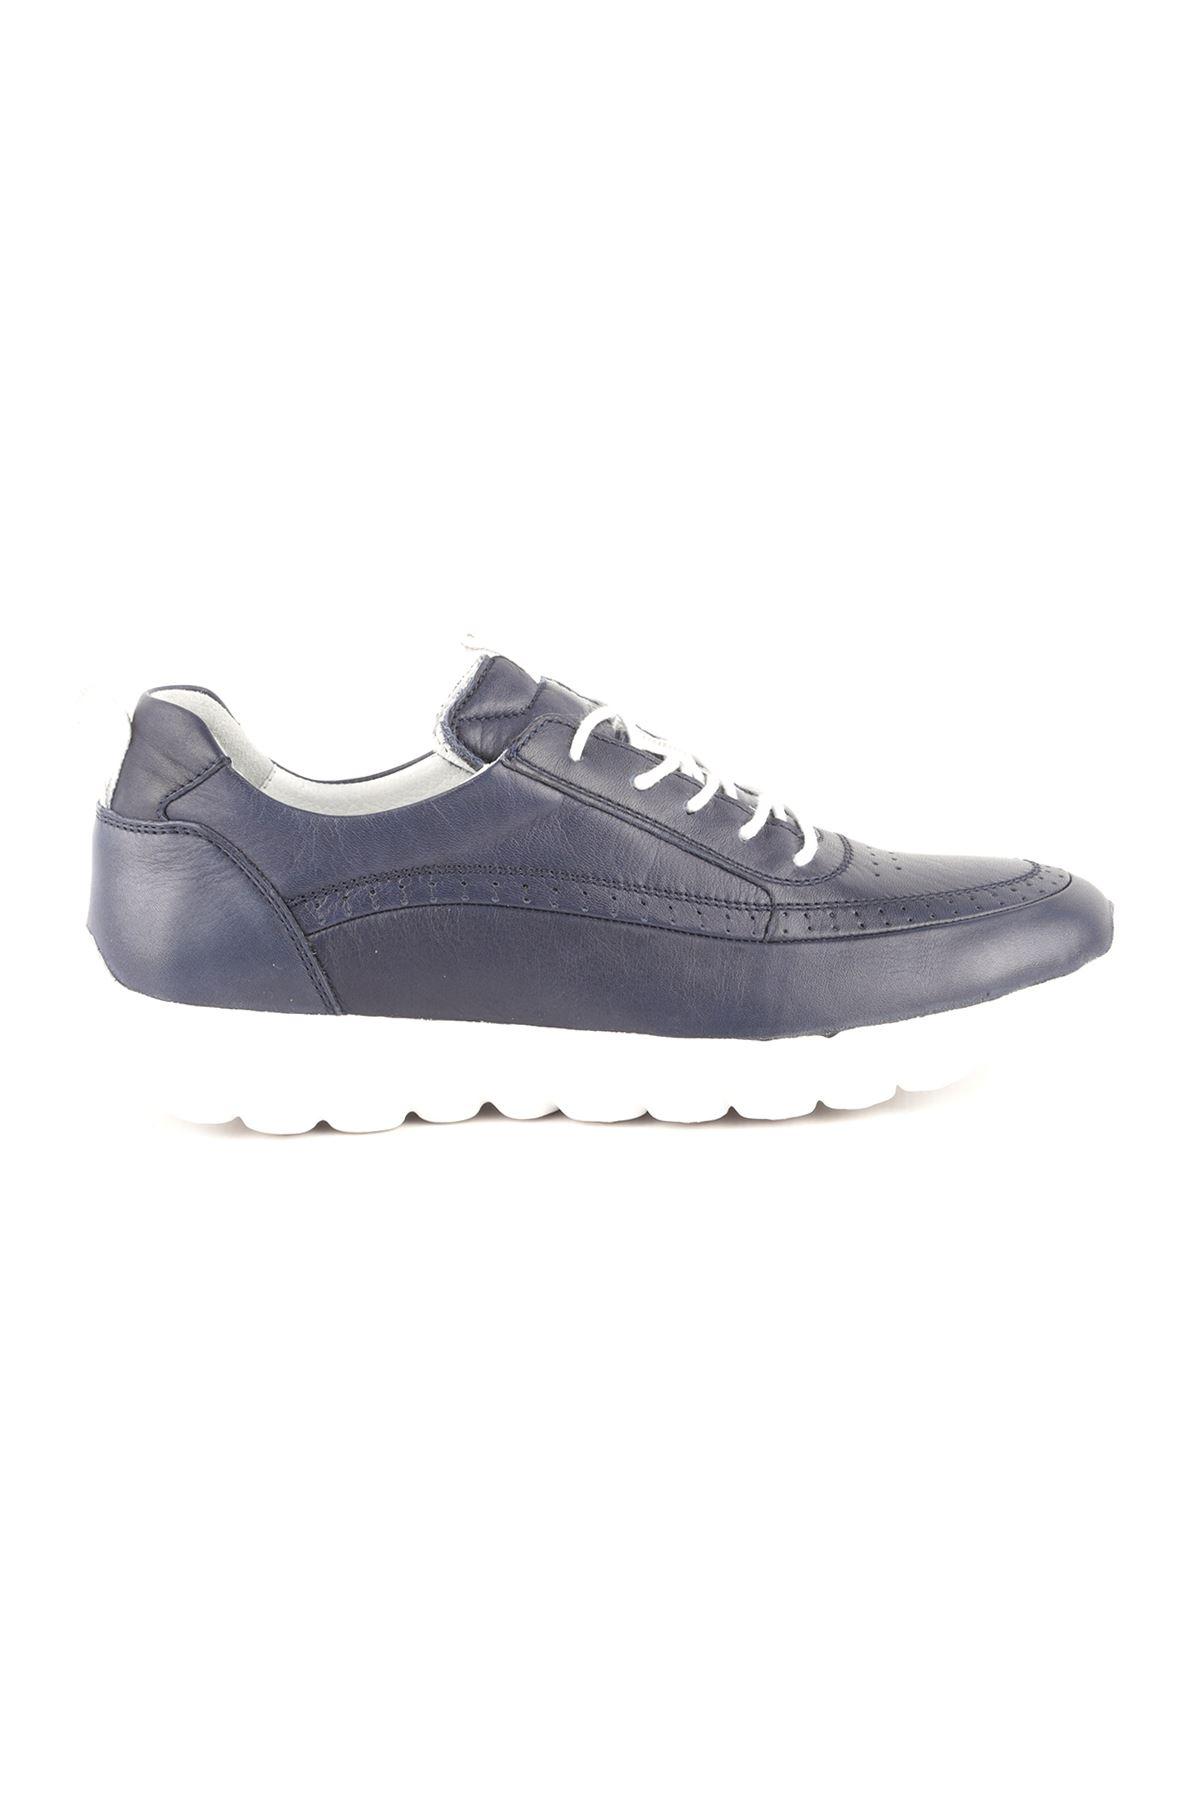 Libero Dİ2018 L.Beyaz Spor Ayakkabı